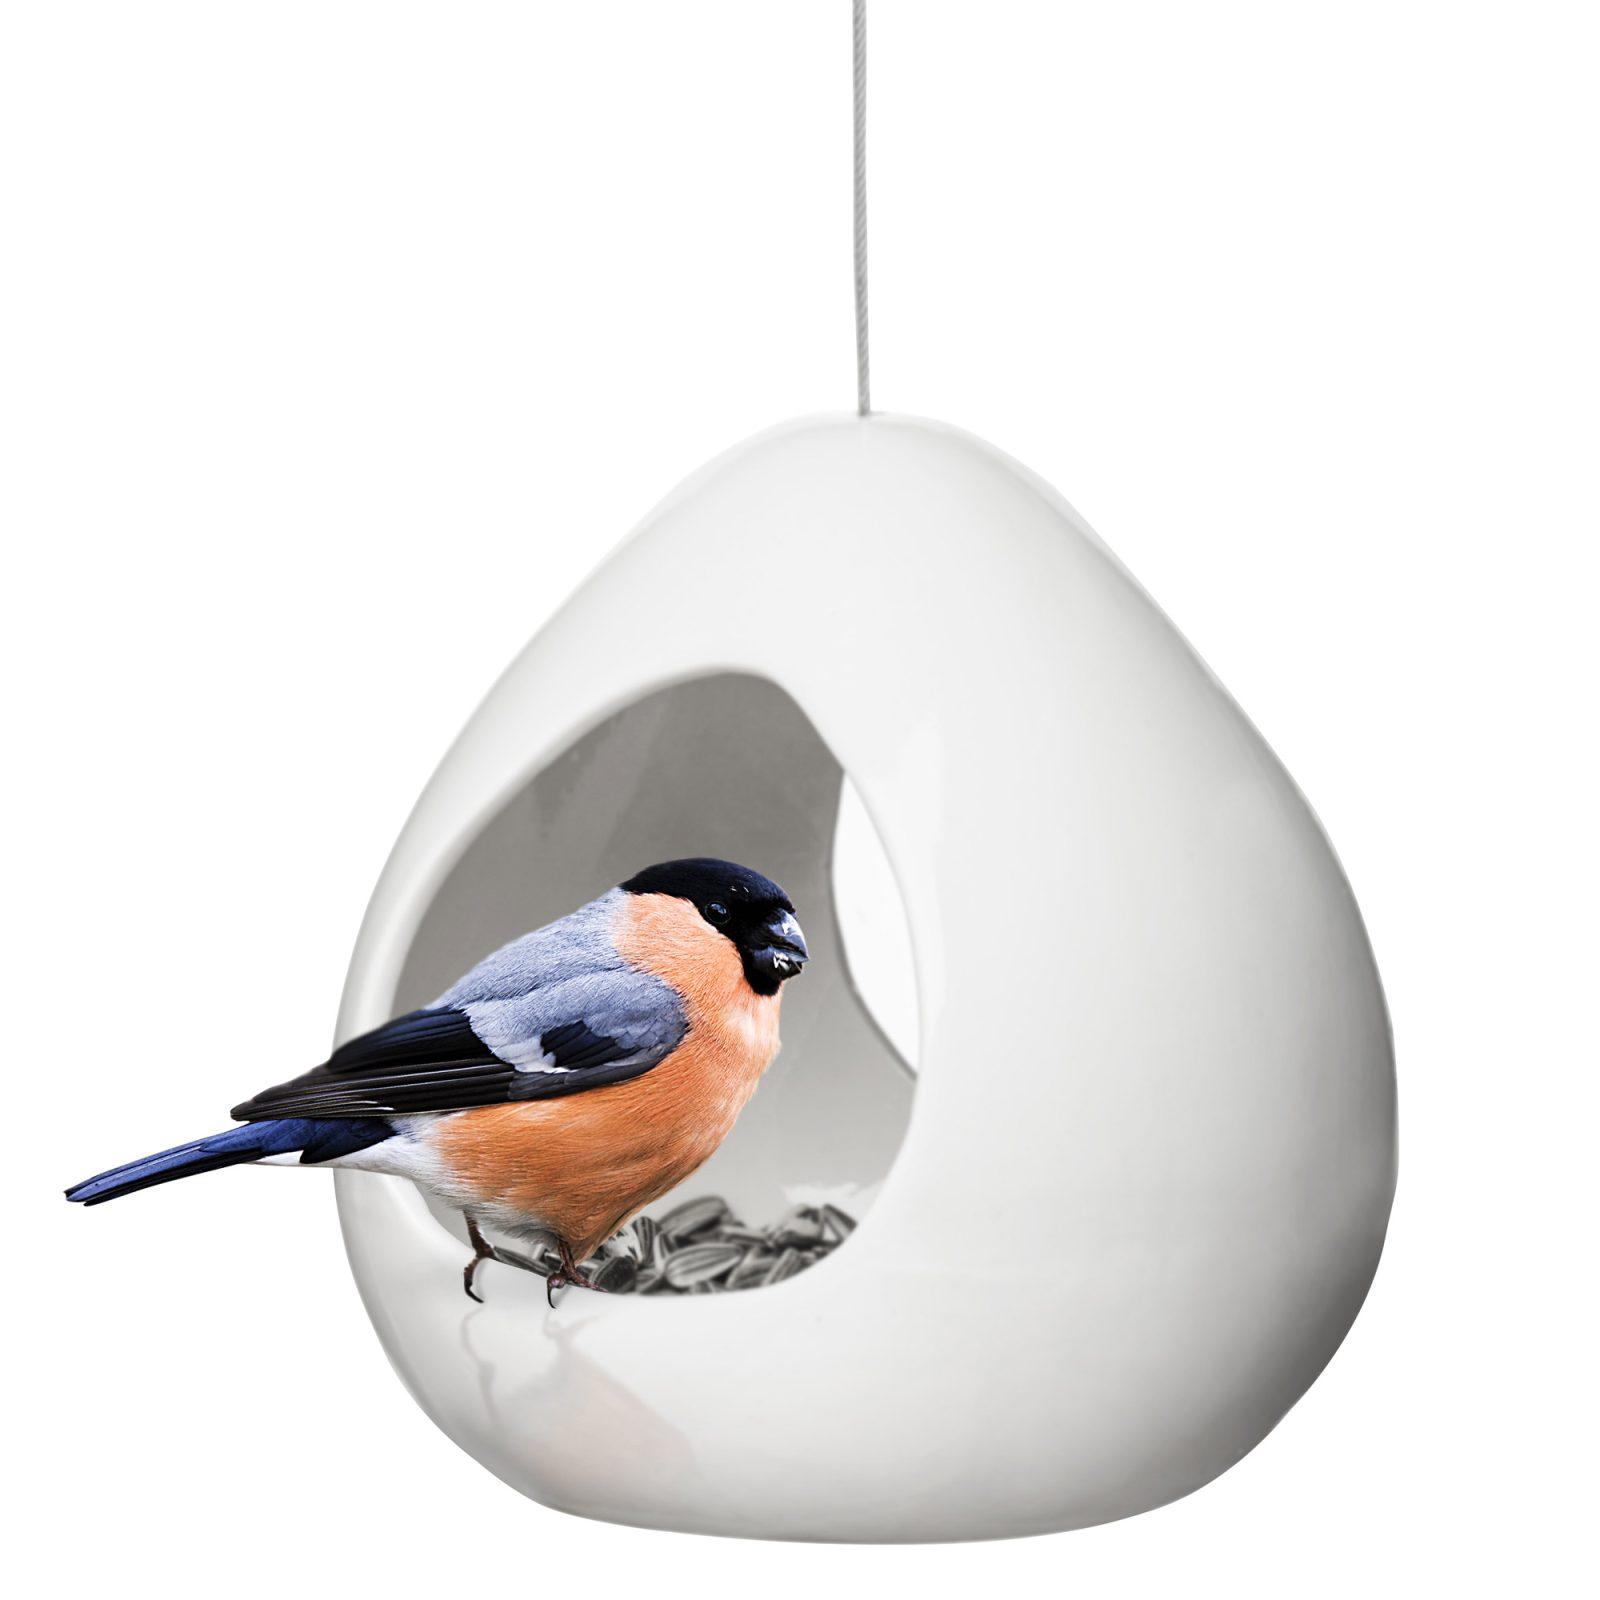 birdy-bird feeder-2